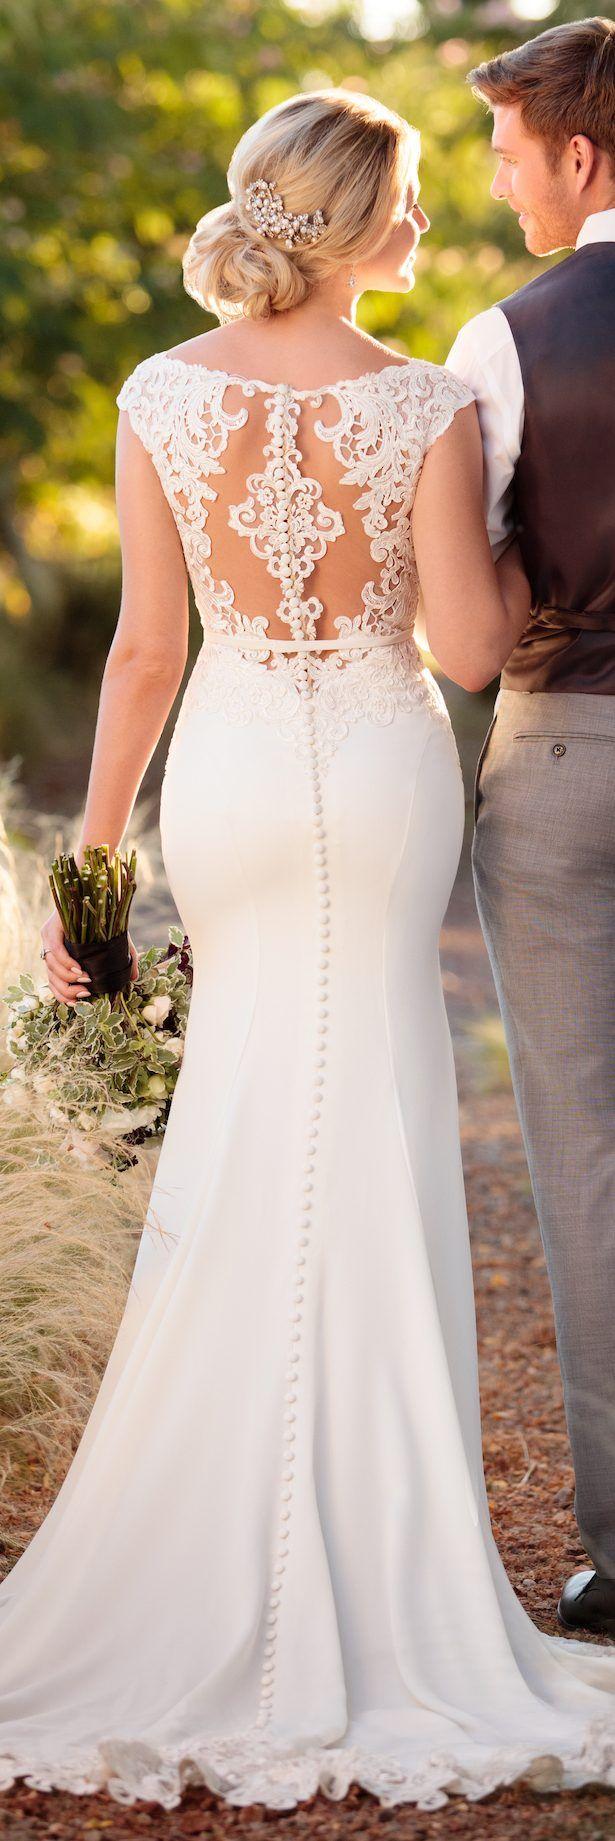 Essense of Australia Spring 2017 Bridal Collection